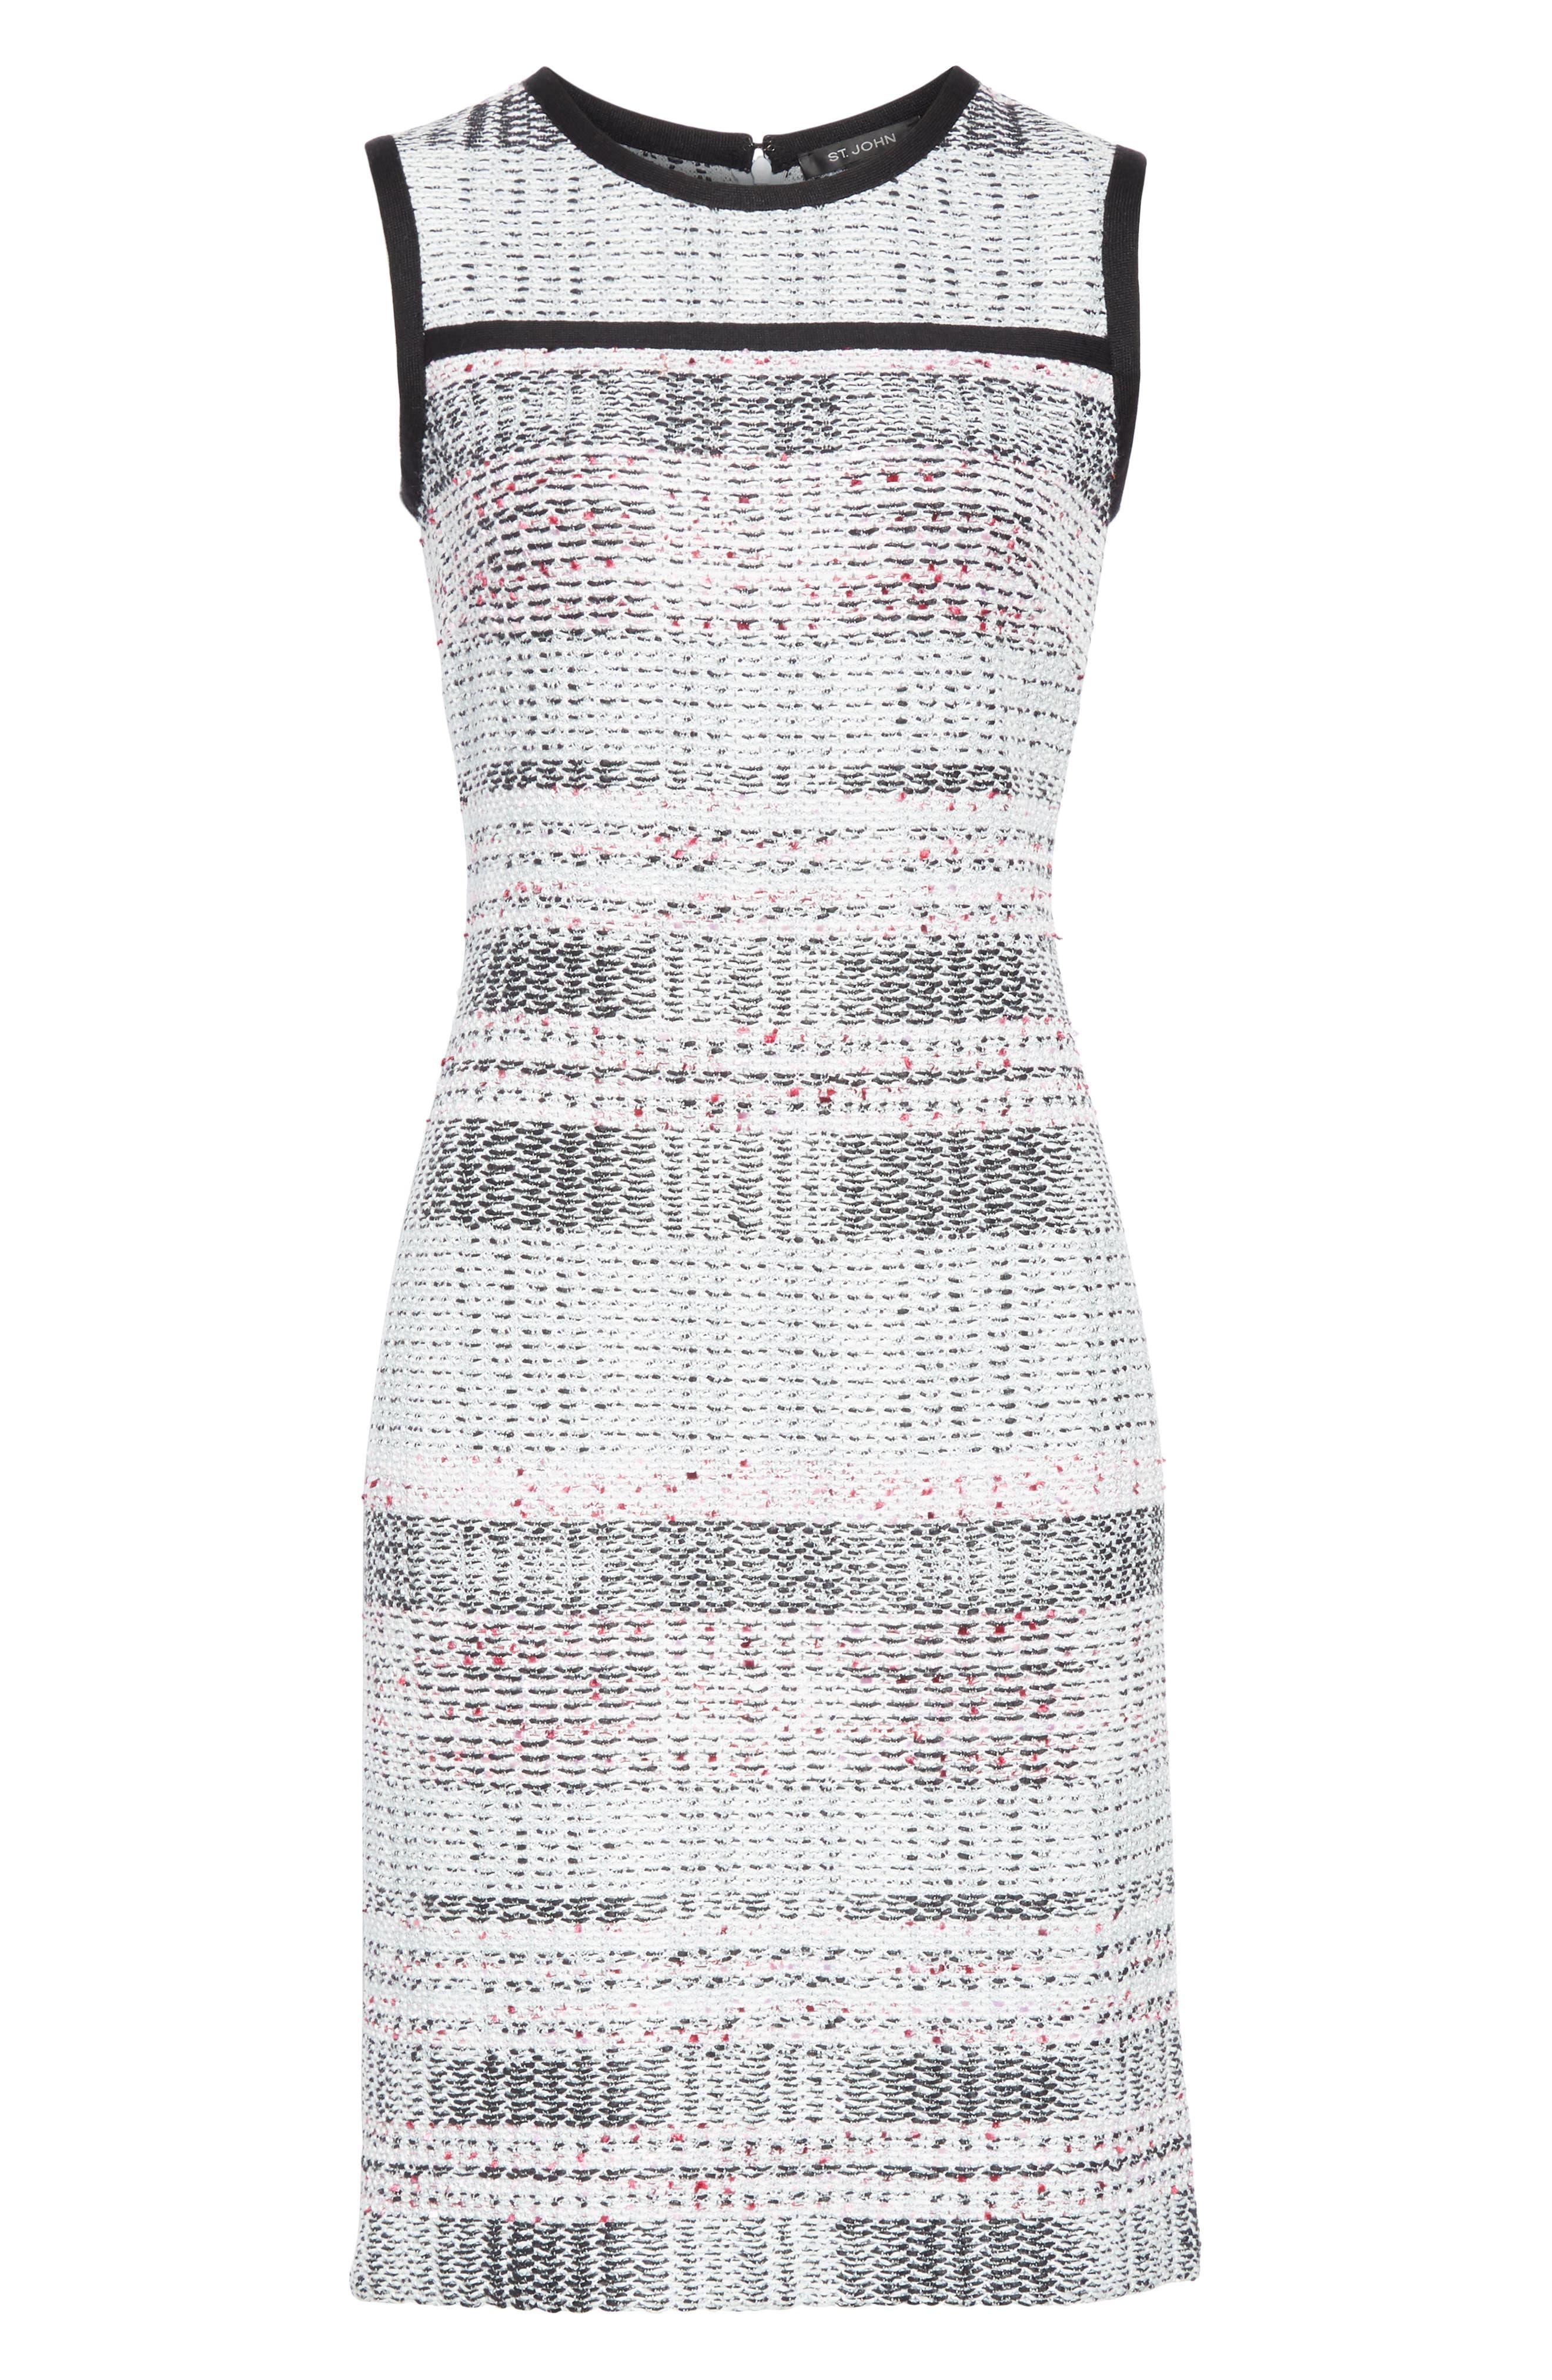 ST. JOHN COLLECTION, Bianca Plaid Knit Sheath Dress, Alternate thumbnail 7, color, GREY MULTI